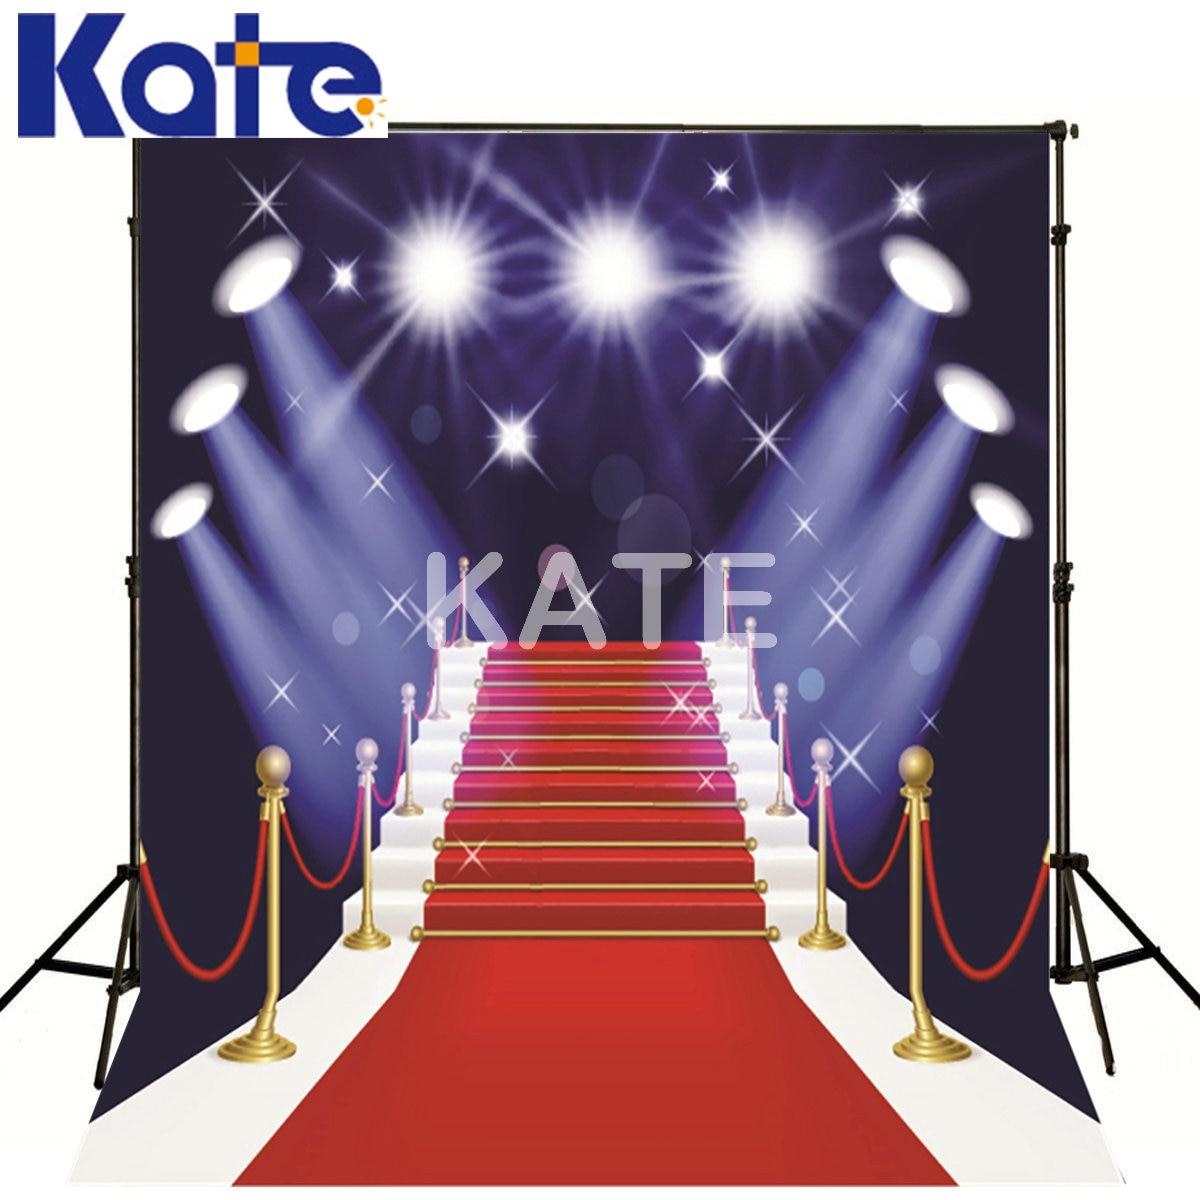 Kate Photo Studio Backdrop Red Carpet Ladder Stage Lighting Kate Background Wedding<br>